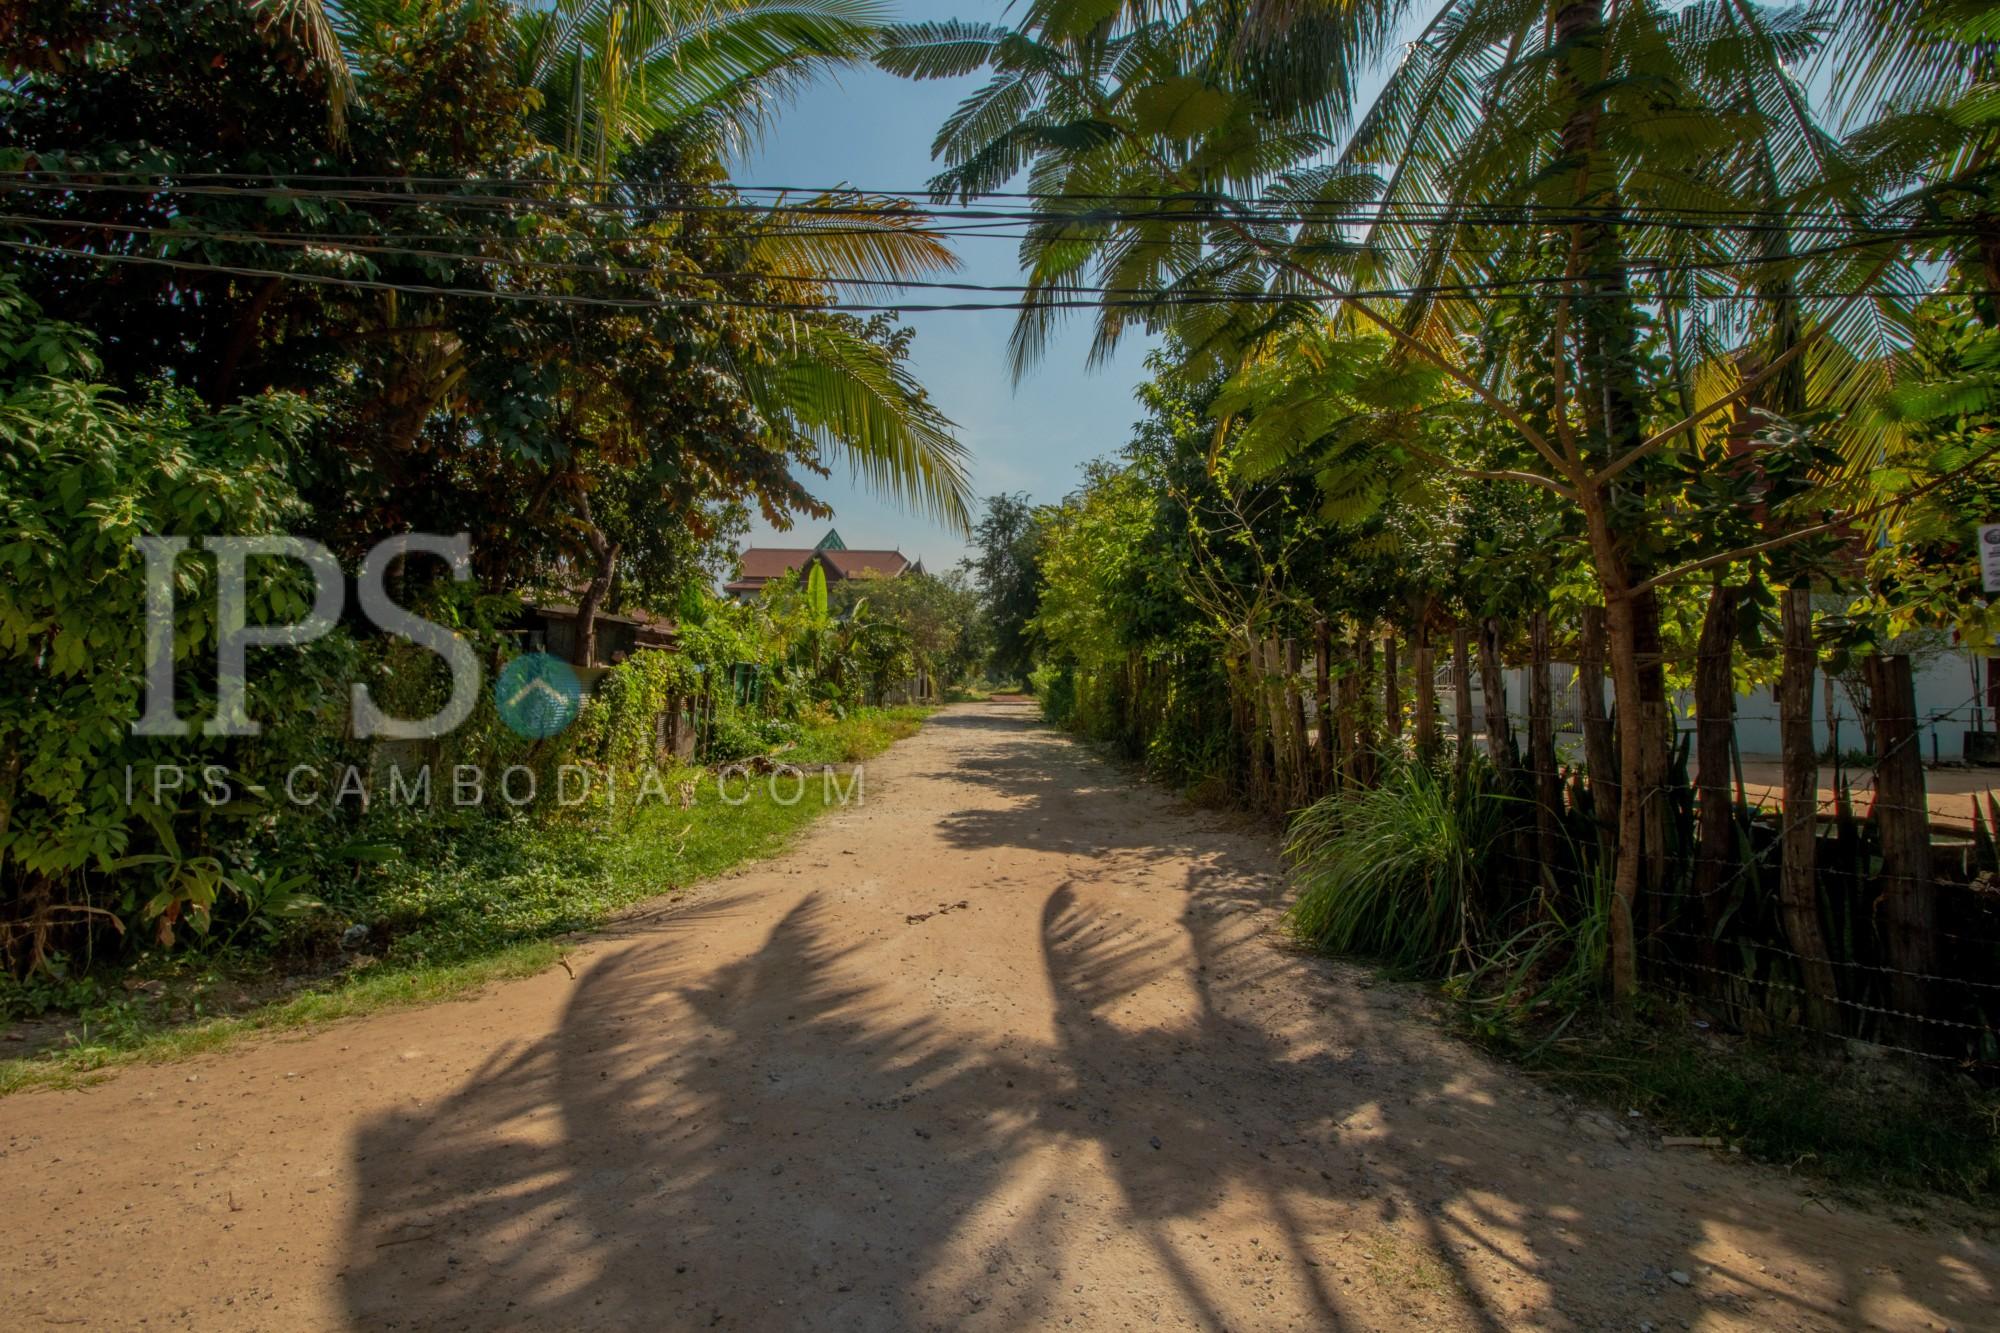 1162 Sqm Land For Sale - Sro Ngae, Siem Reap